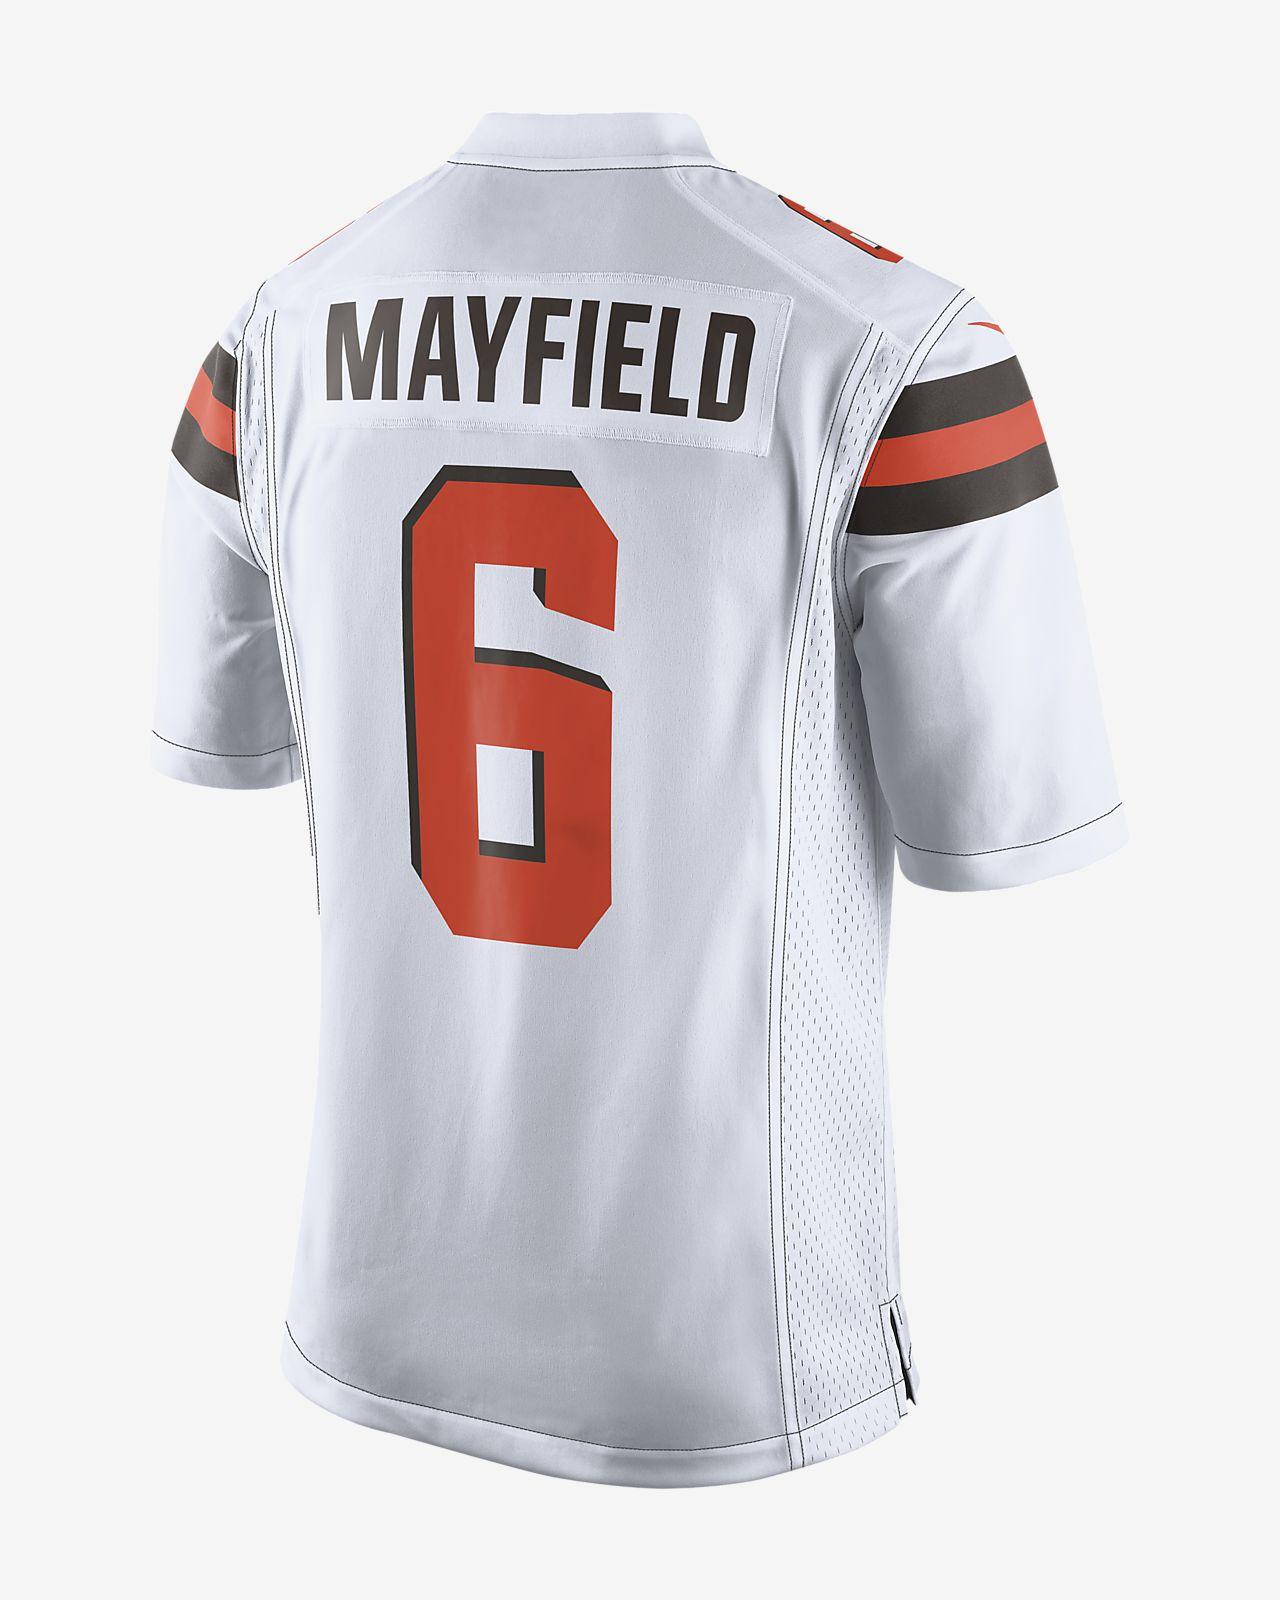 4689918d1 NFL Cleveland Browns (Baker Mayfield) Men s Game Football Jersey ...